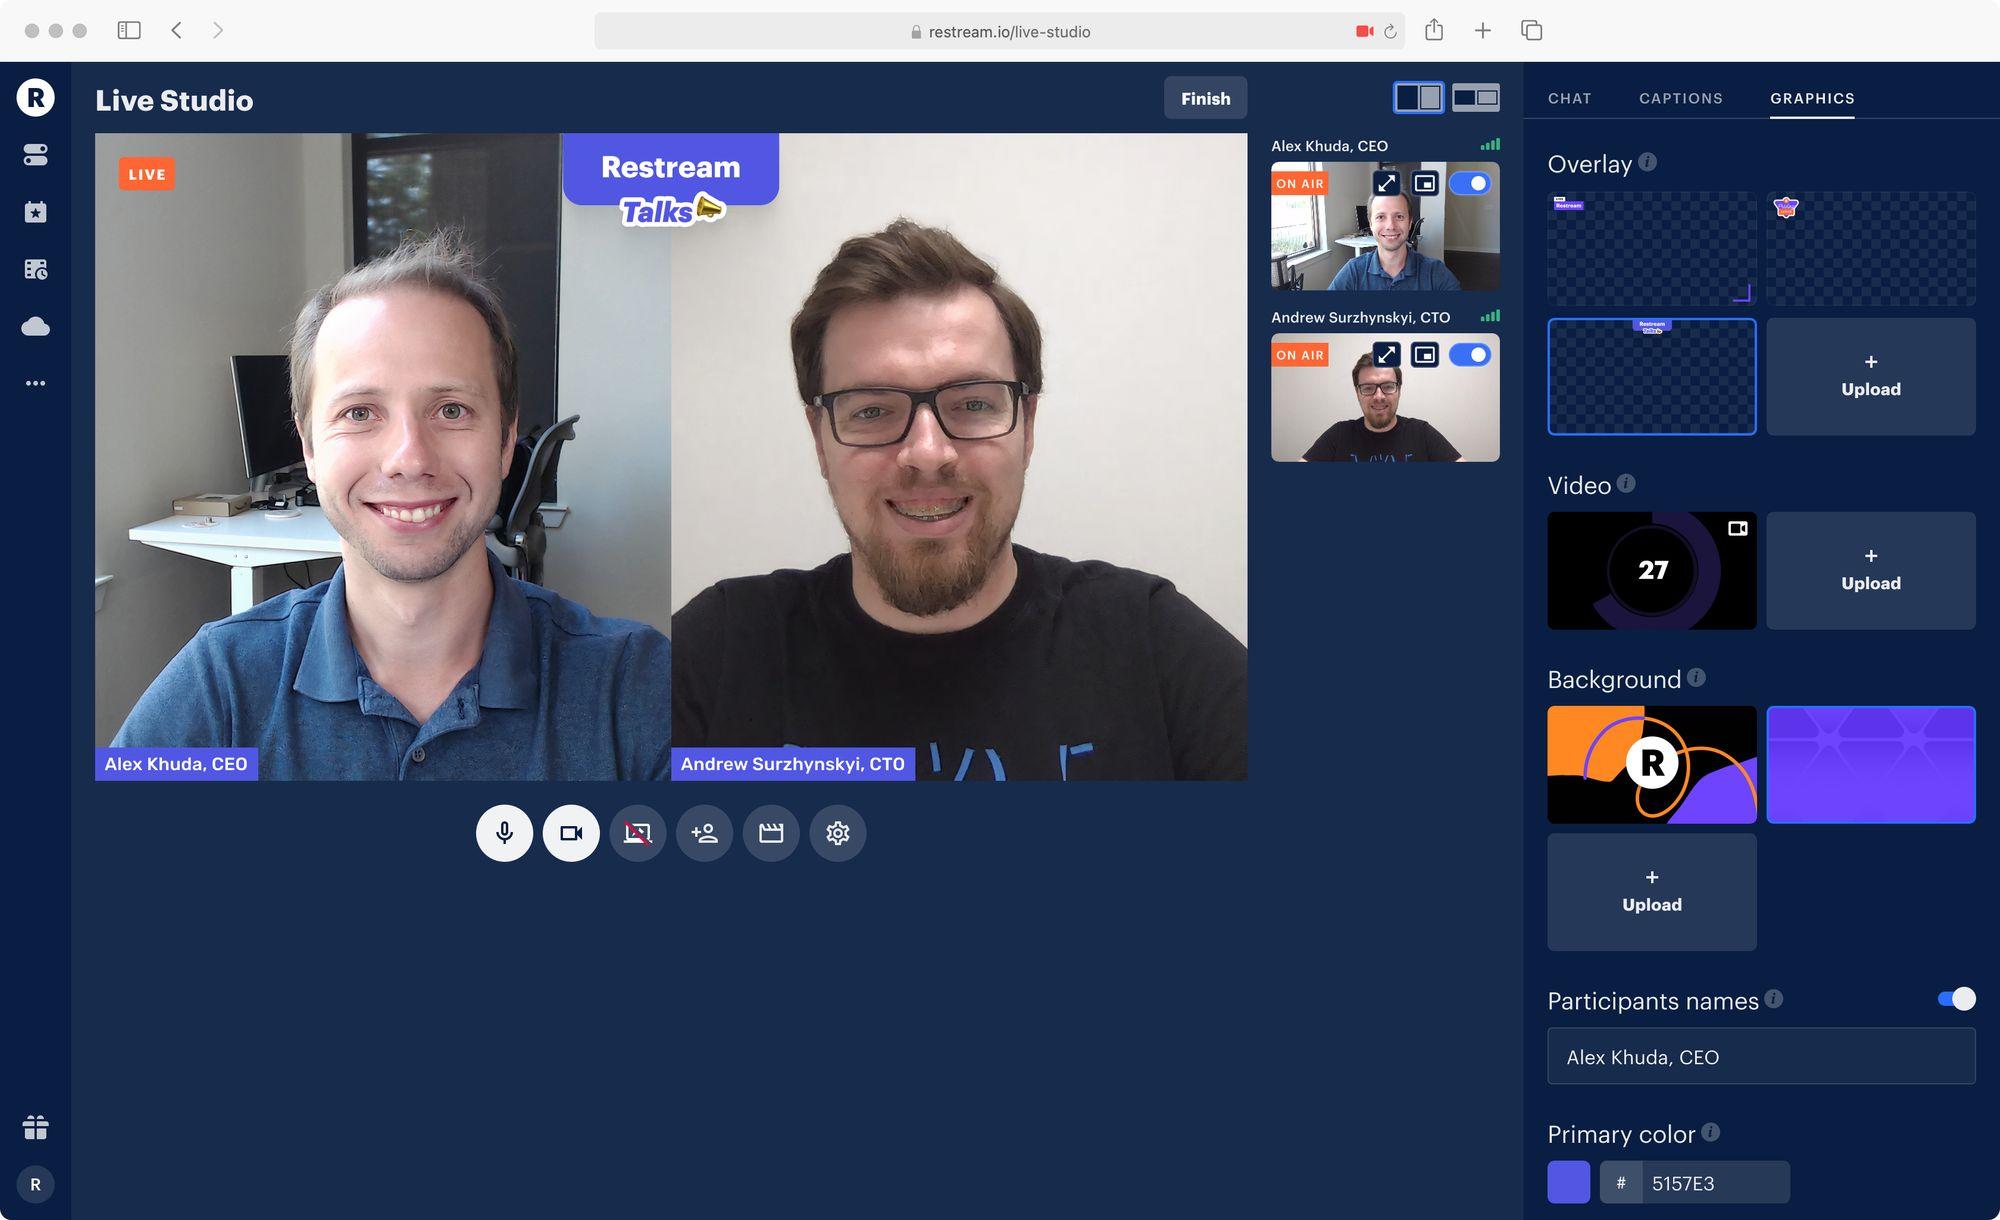 Restream Talks with Alex Khuda and Andrew Surzhynskyi using Restream Studio